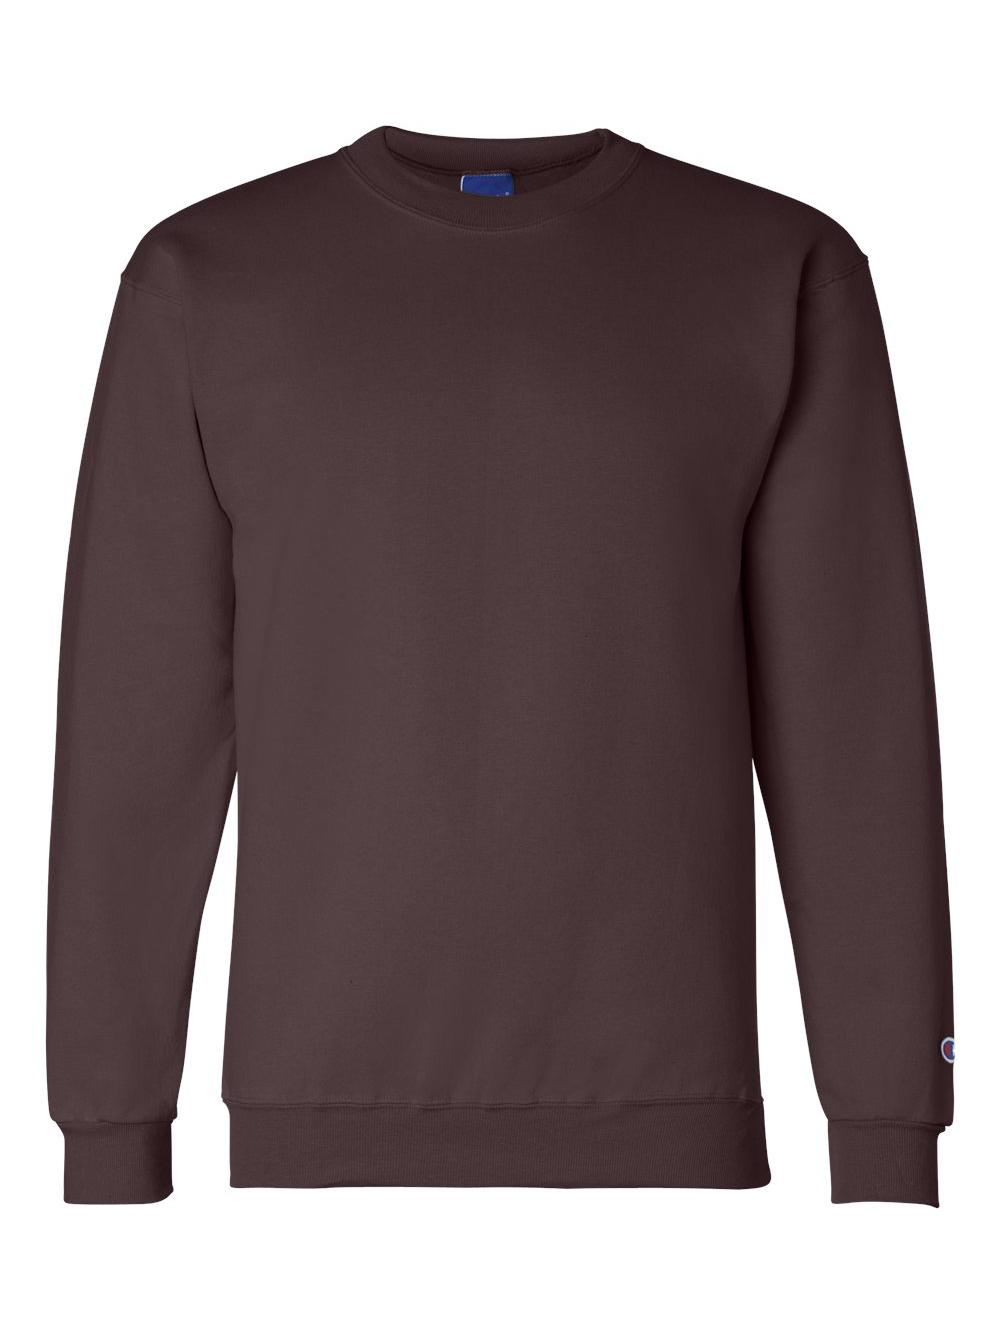 Champion-Double-Dry-Eco-Crewneck-Sweatshirt-S600 thumbnail 12